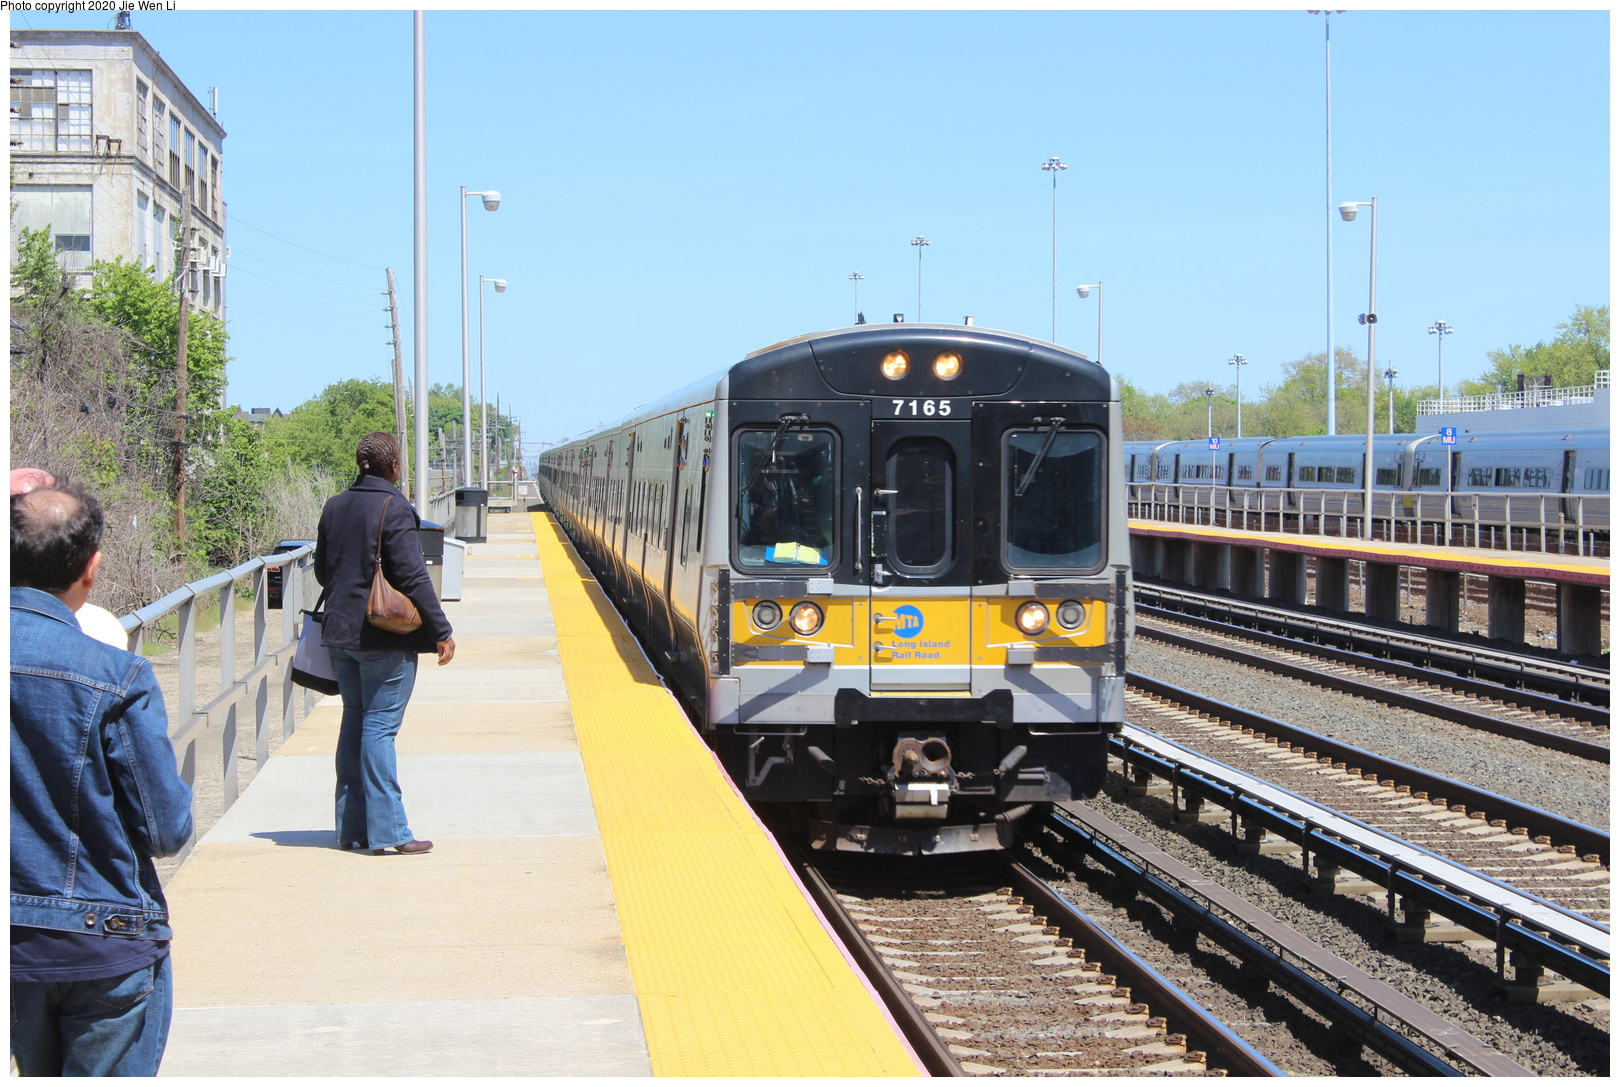 (719k, 1620x1087)<br><b>Country:</b> United States<br><b>City:</b> New York<br><b>System:</b> Long Island Rail Road<br><b>Location:</b> LIRR Holban-Hillside Maint. Complex/Yard<br><b>Car:</b> LIRR M-7 EMU (Bombardier) 7165 <br><b>Photo by:</b> Jie Wen Li<br><b>Date:</b> 5/11/2019<br><b>Notes:</b> Shop tour sponsored by ERA.<br><b>Viewed (this week/total):</b> 6 / 48